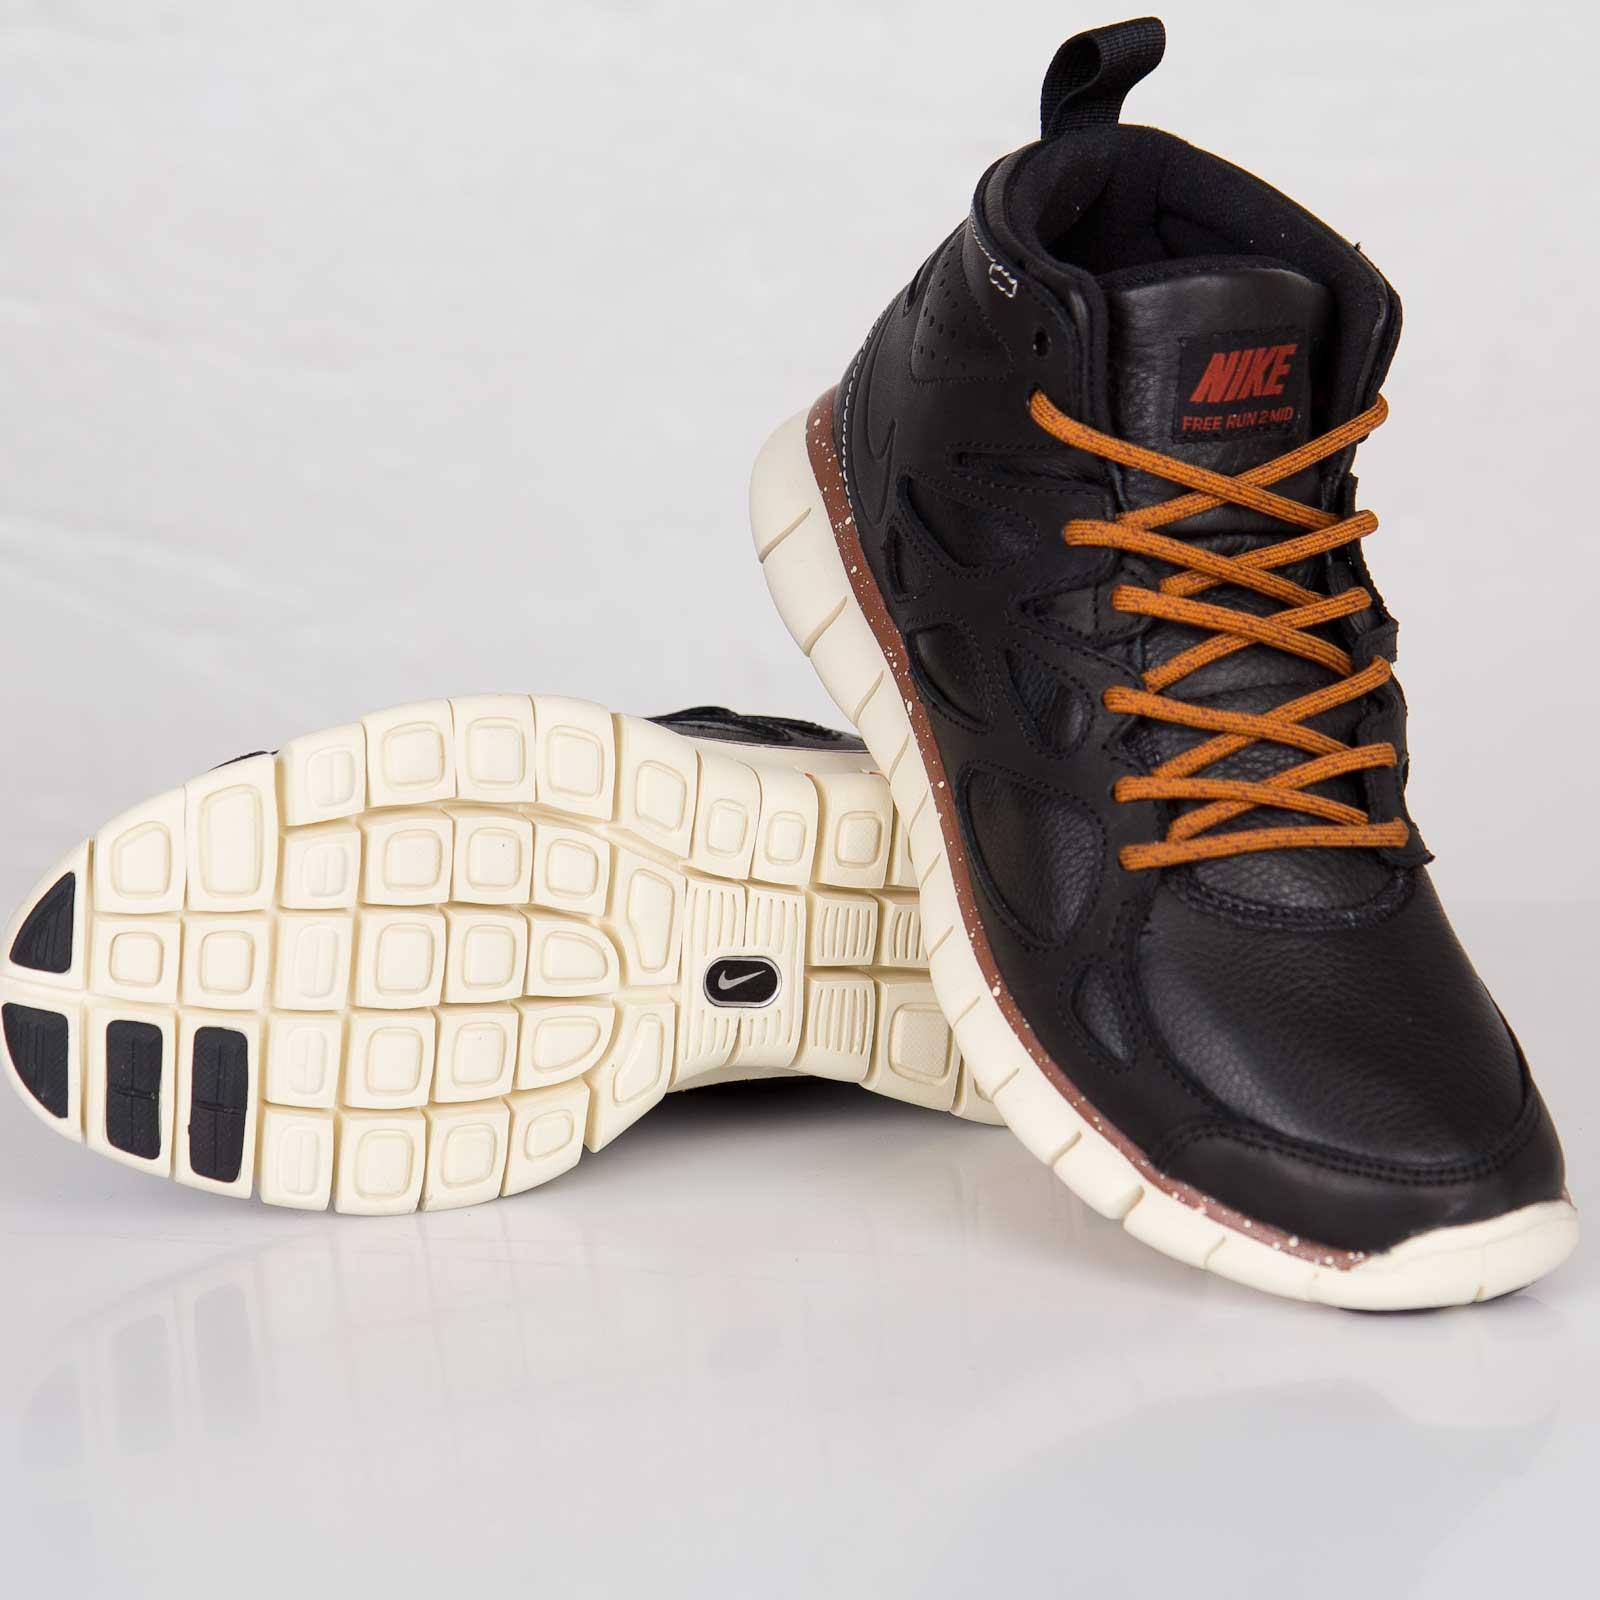 buy online a91f4 2c267 Nike Free Run 2 Sneakerboot QS - 637996-001 - Sneakersnstuff   sneakers    streetwear online since 1999